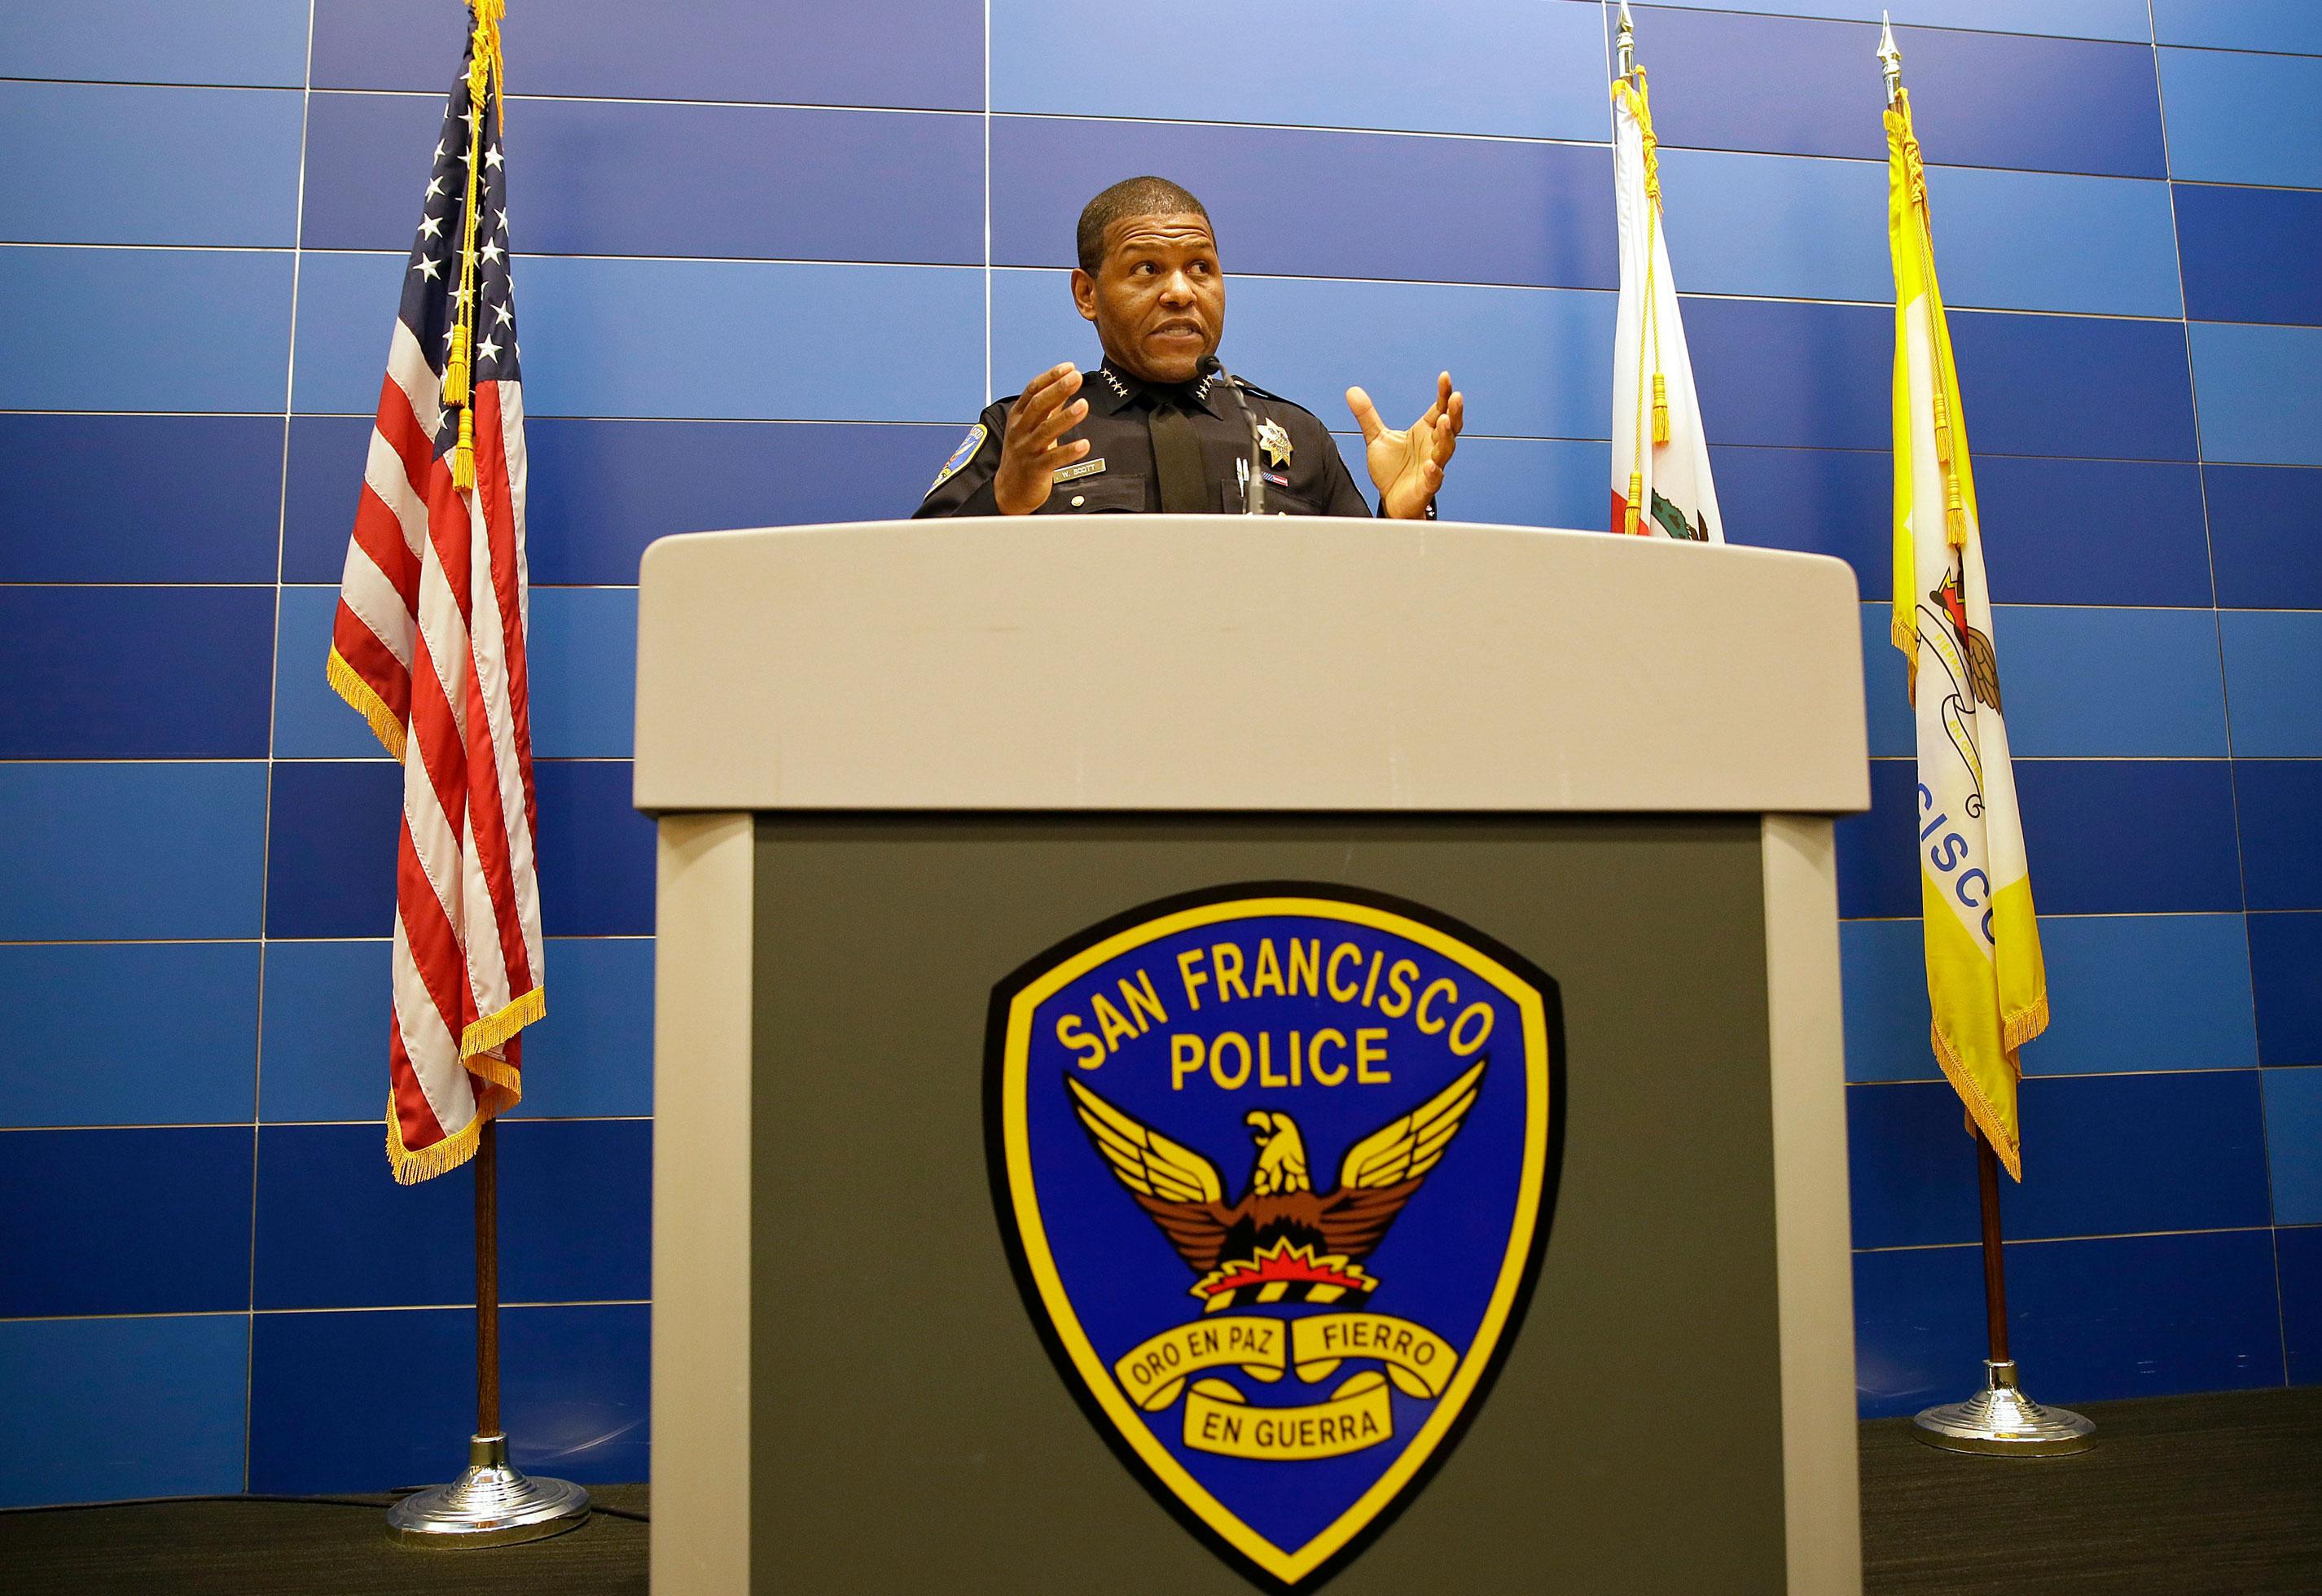 San Francisco Police Department will stop releasing most mug shots to combat racial bias